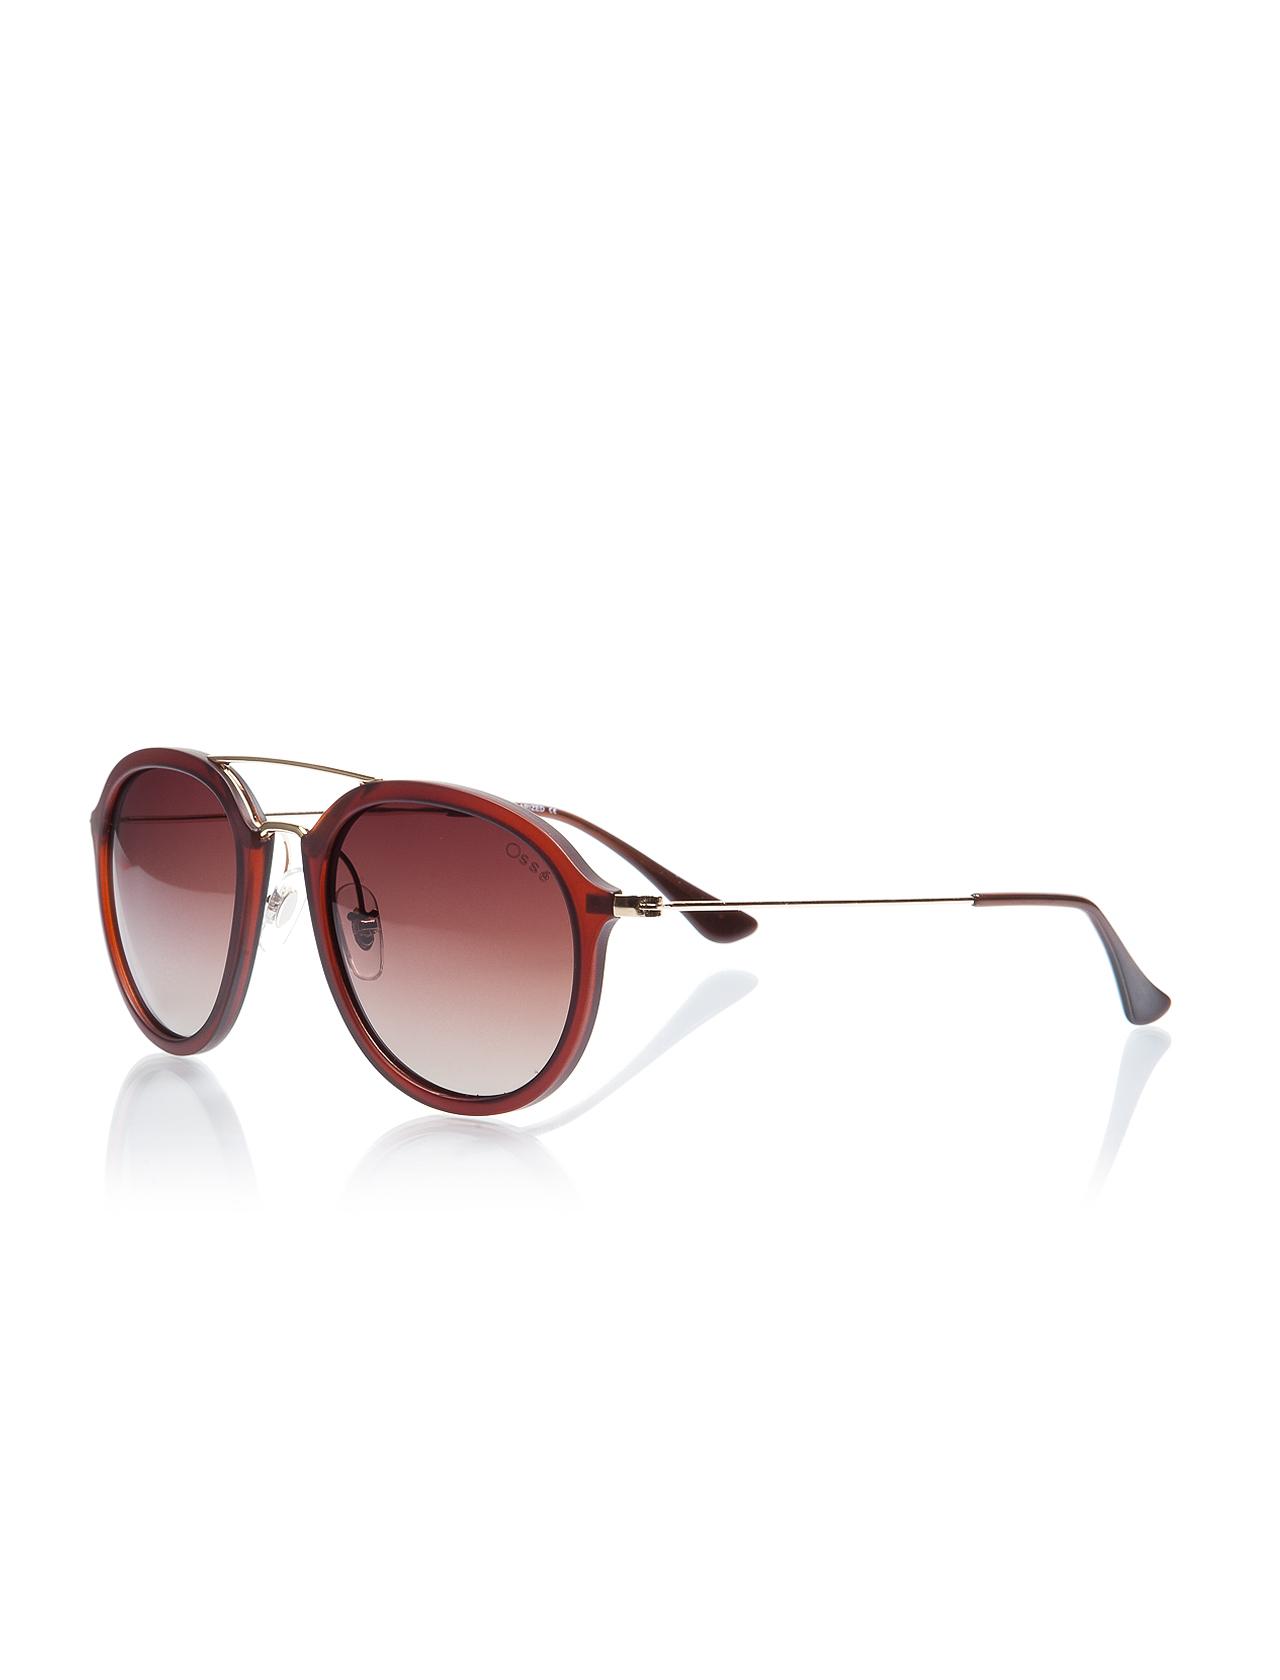 Men's Plastic Frame Metal Sunglasses